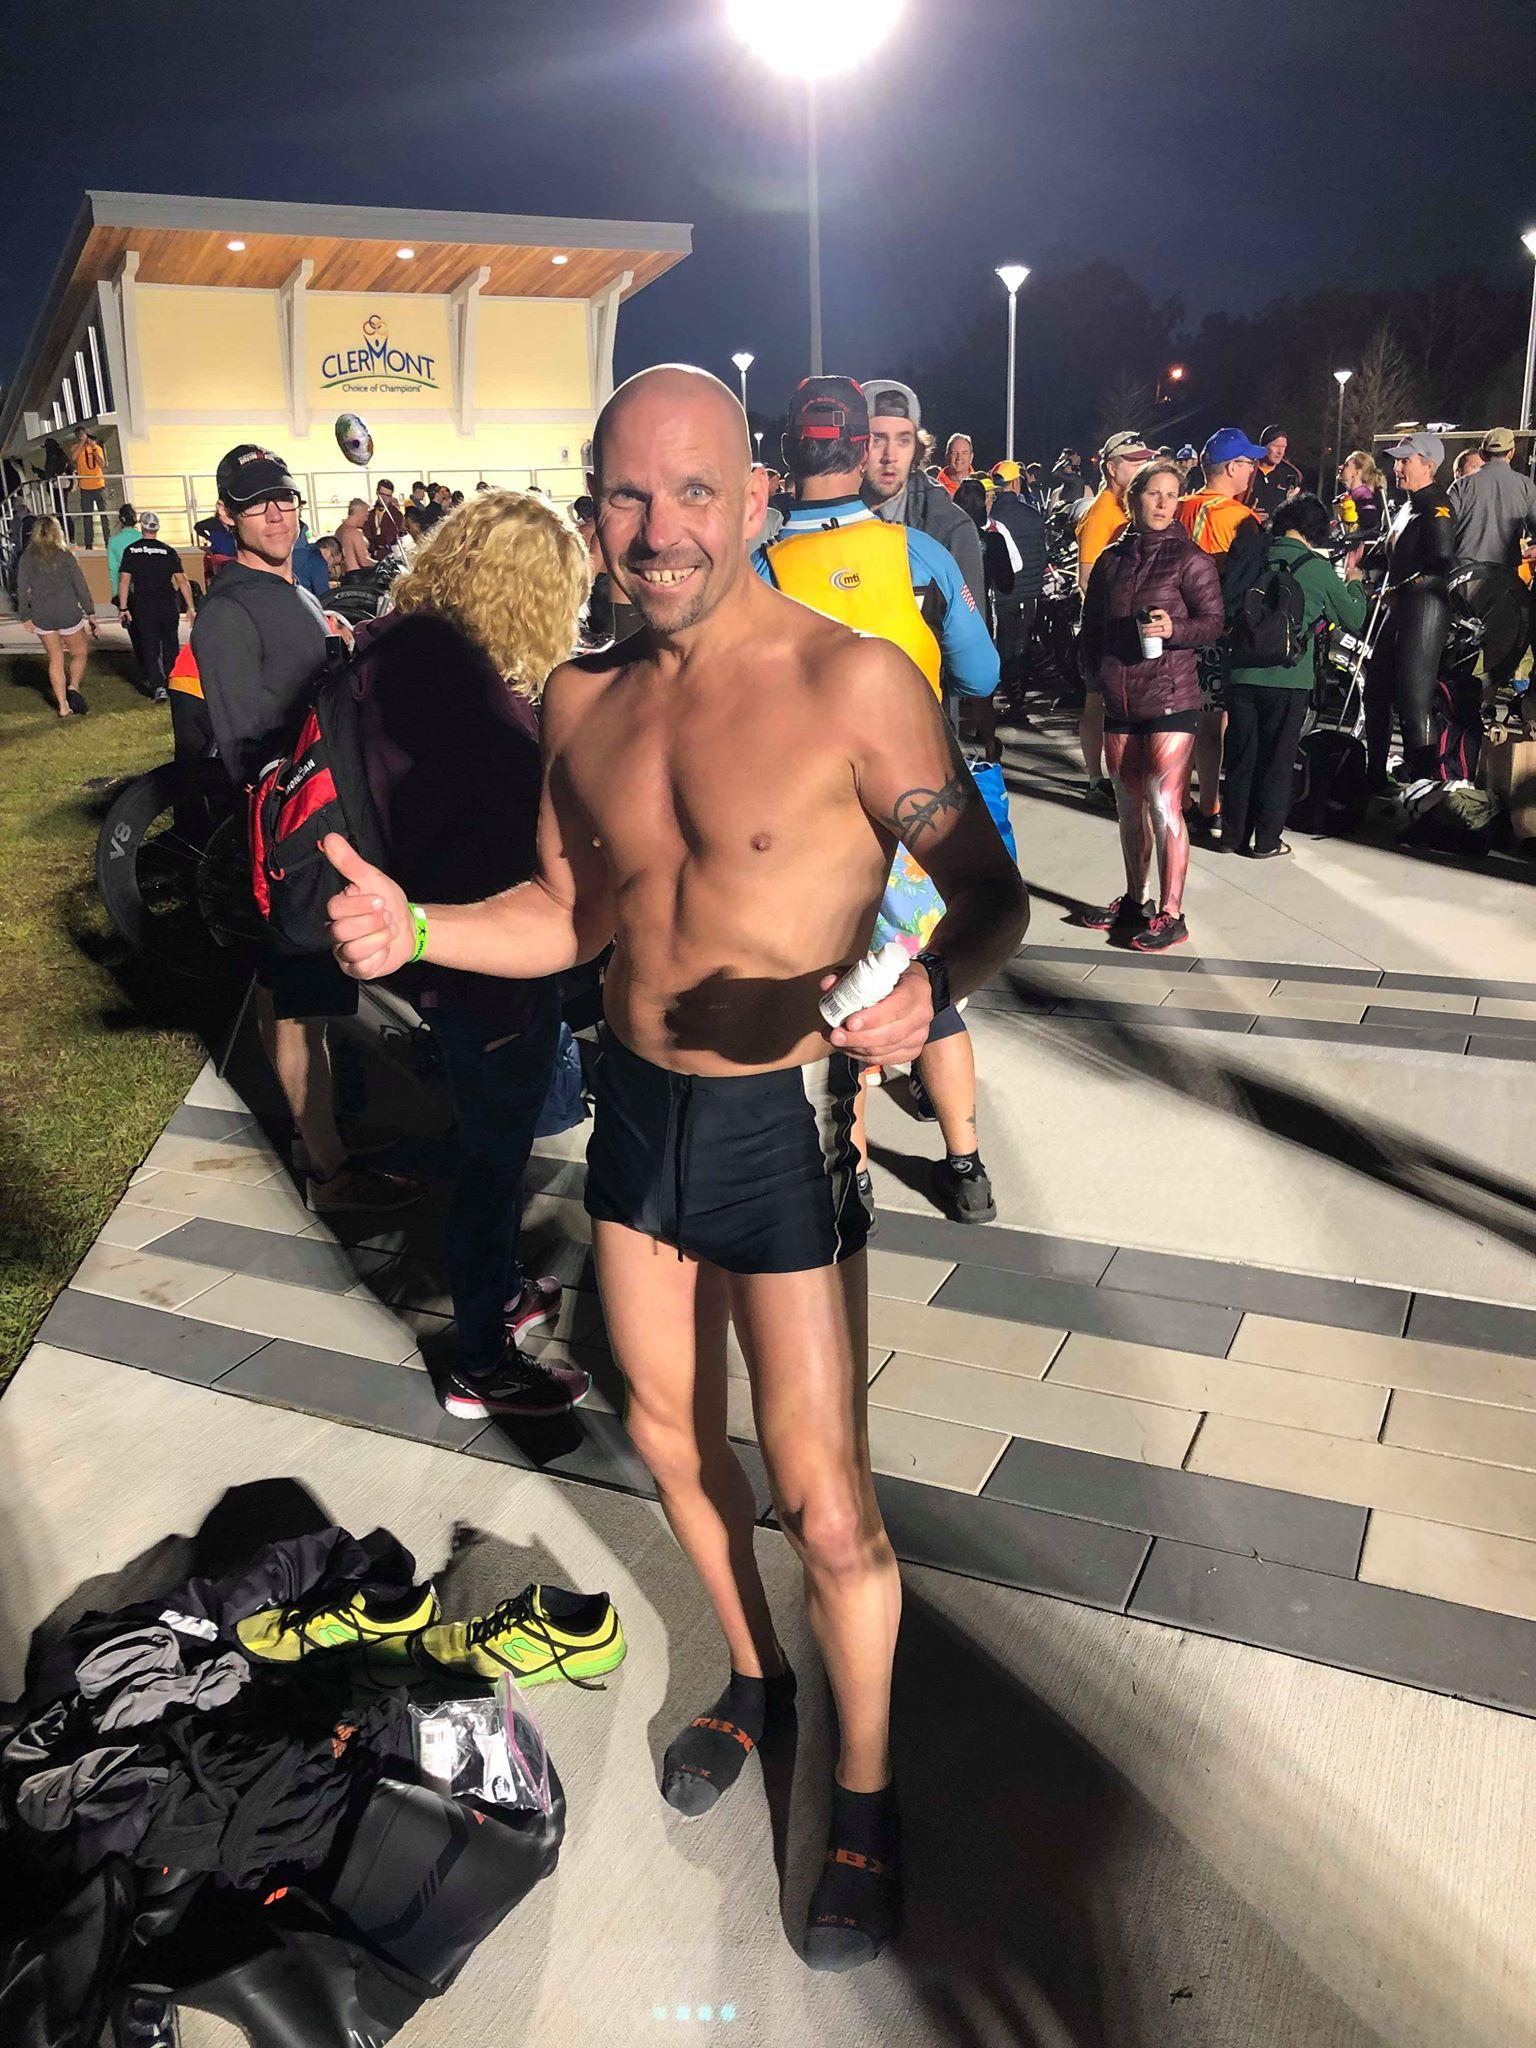 Coach_Terry_Wilson_Pursuit_of_The_Perfect_Race_Ultraman_Florida_Chris_Pollack_9.jpg